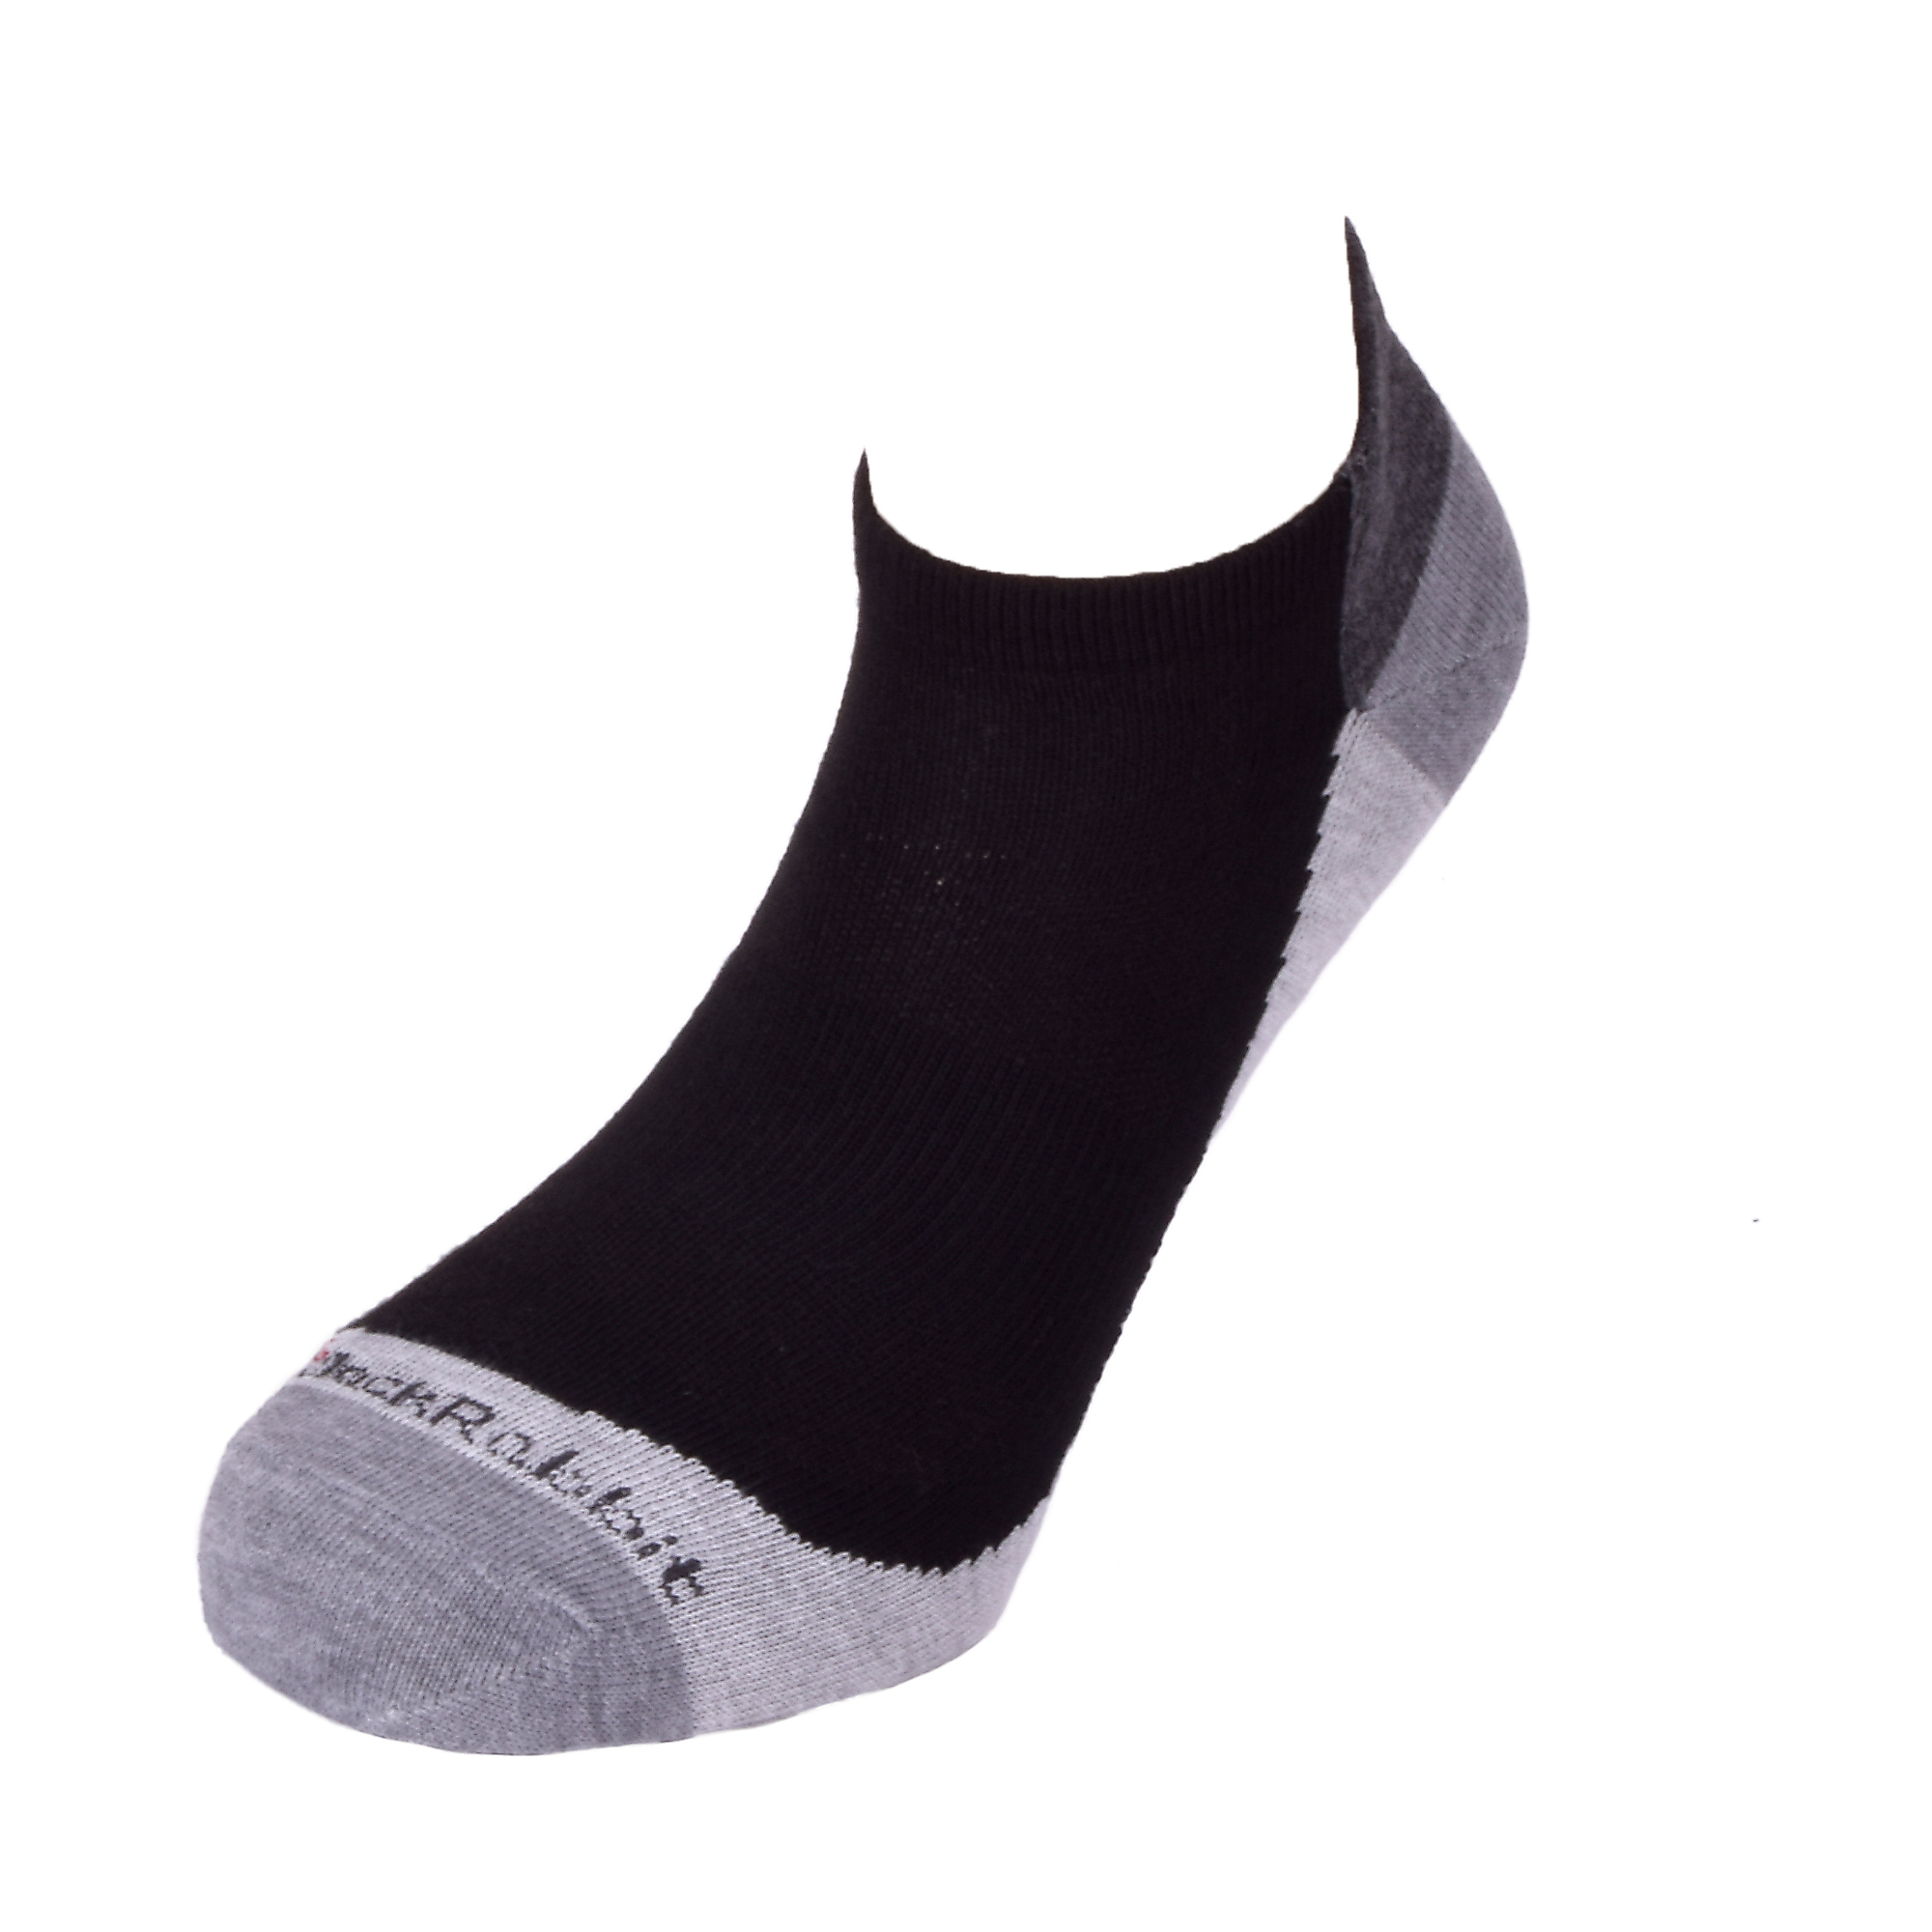 JackRabbit No Show Tab Lite Performance Running Sock - Color: Black - Size: S, Black/Grey, large, image 2